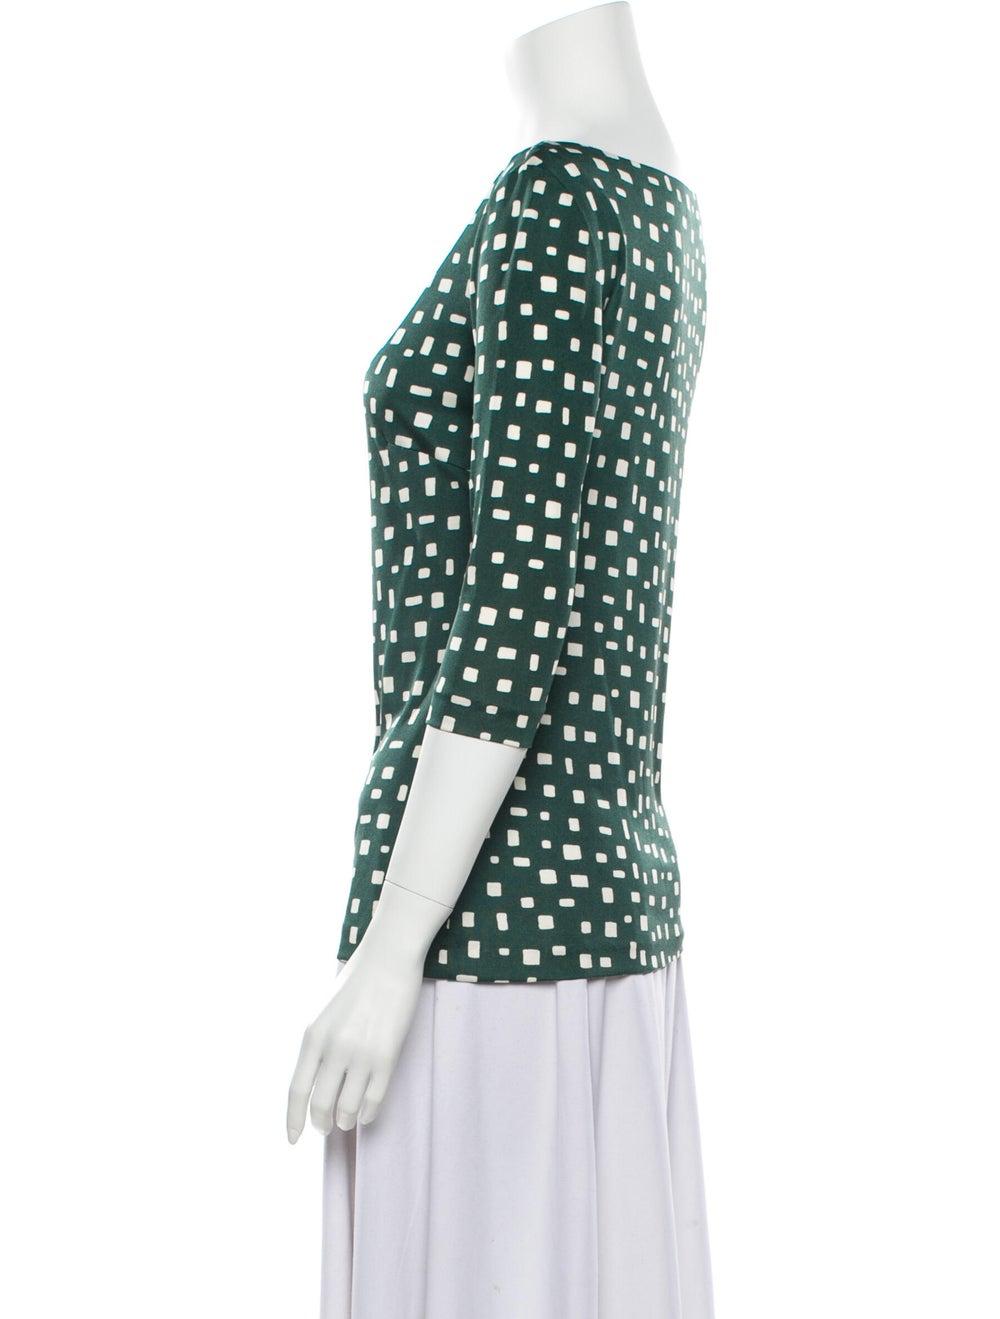 Prada 2013 Silk Blouse Green - image 2